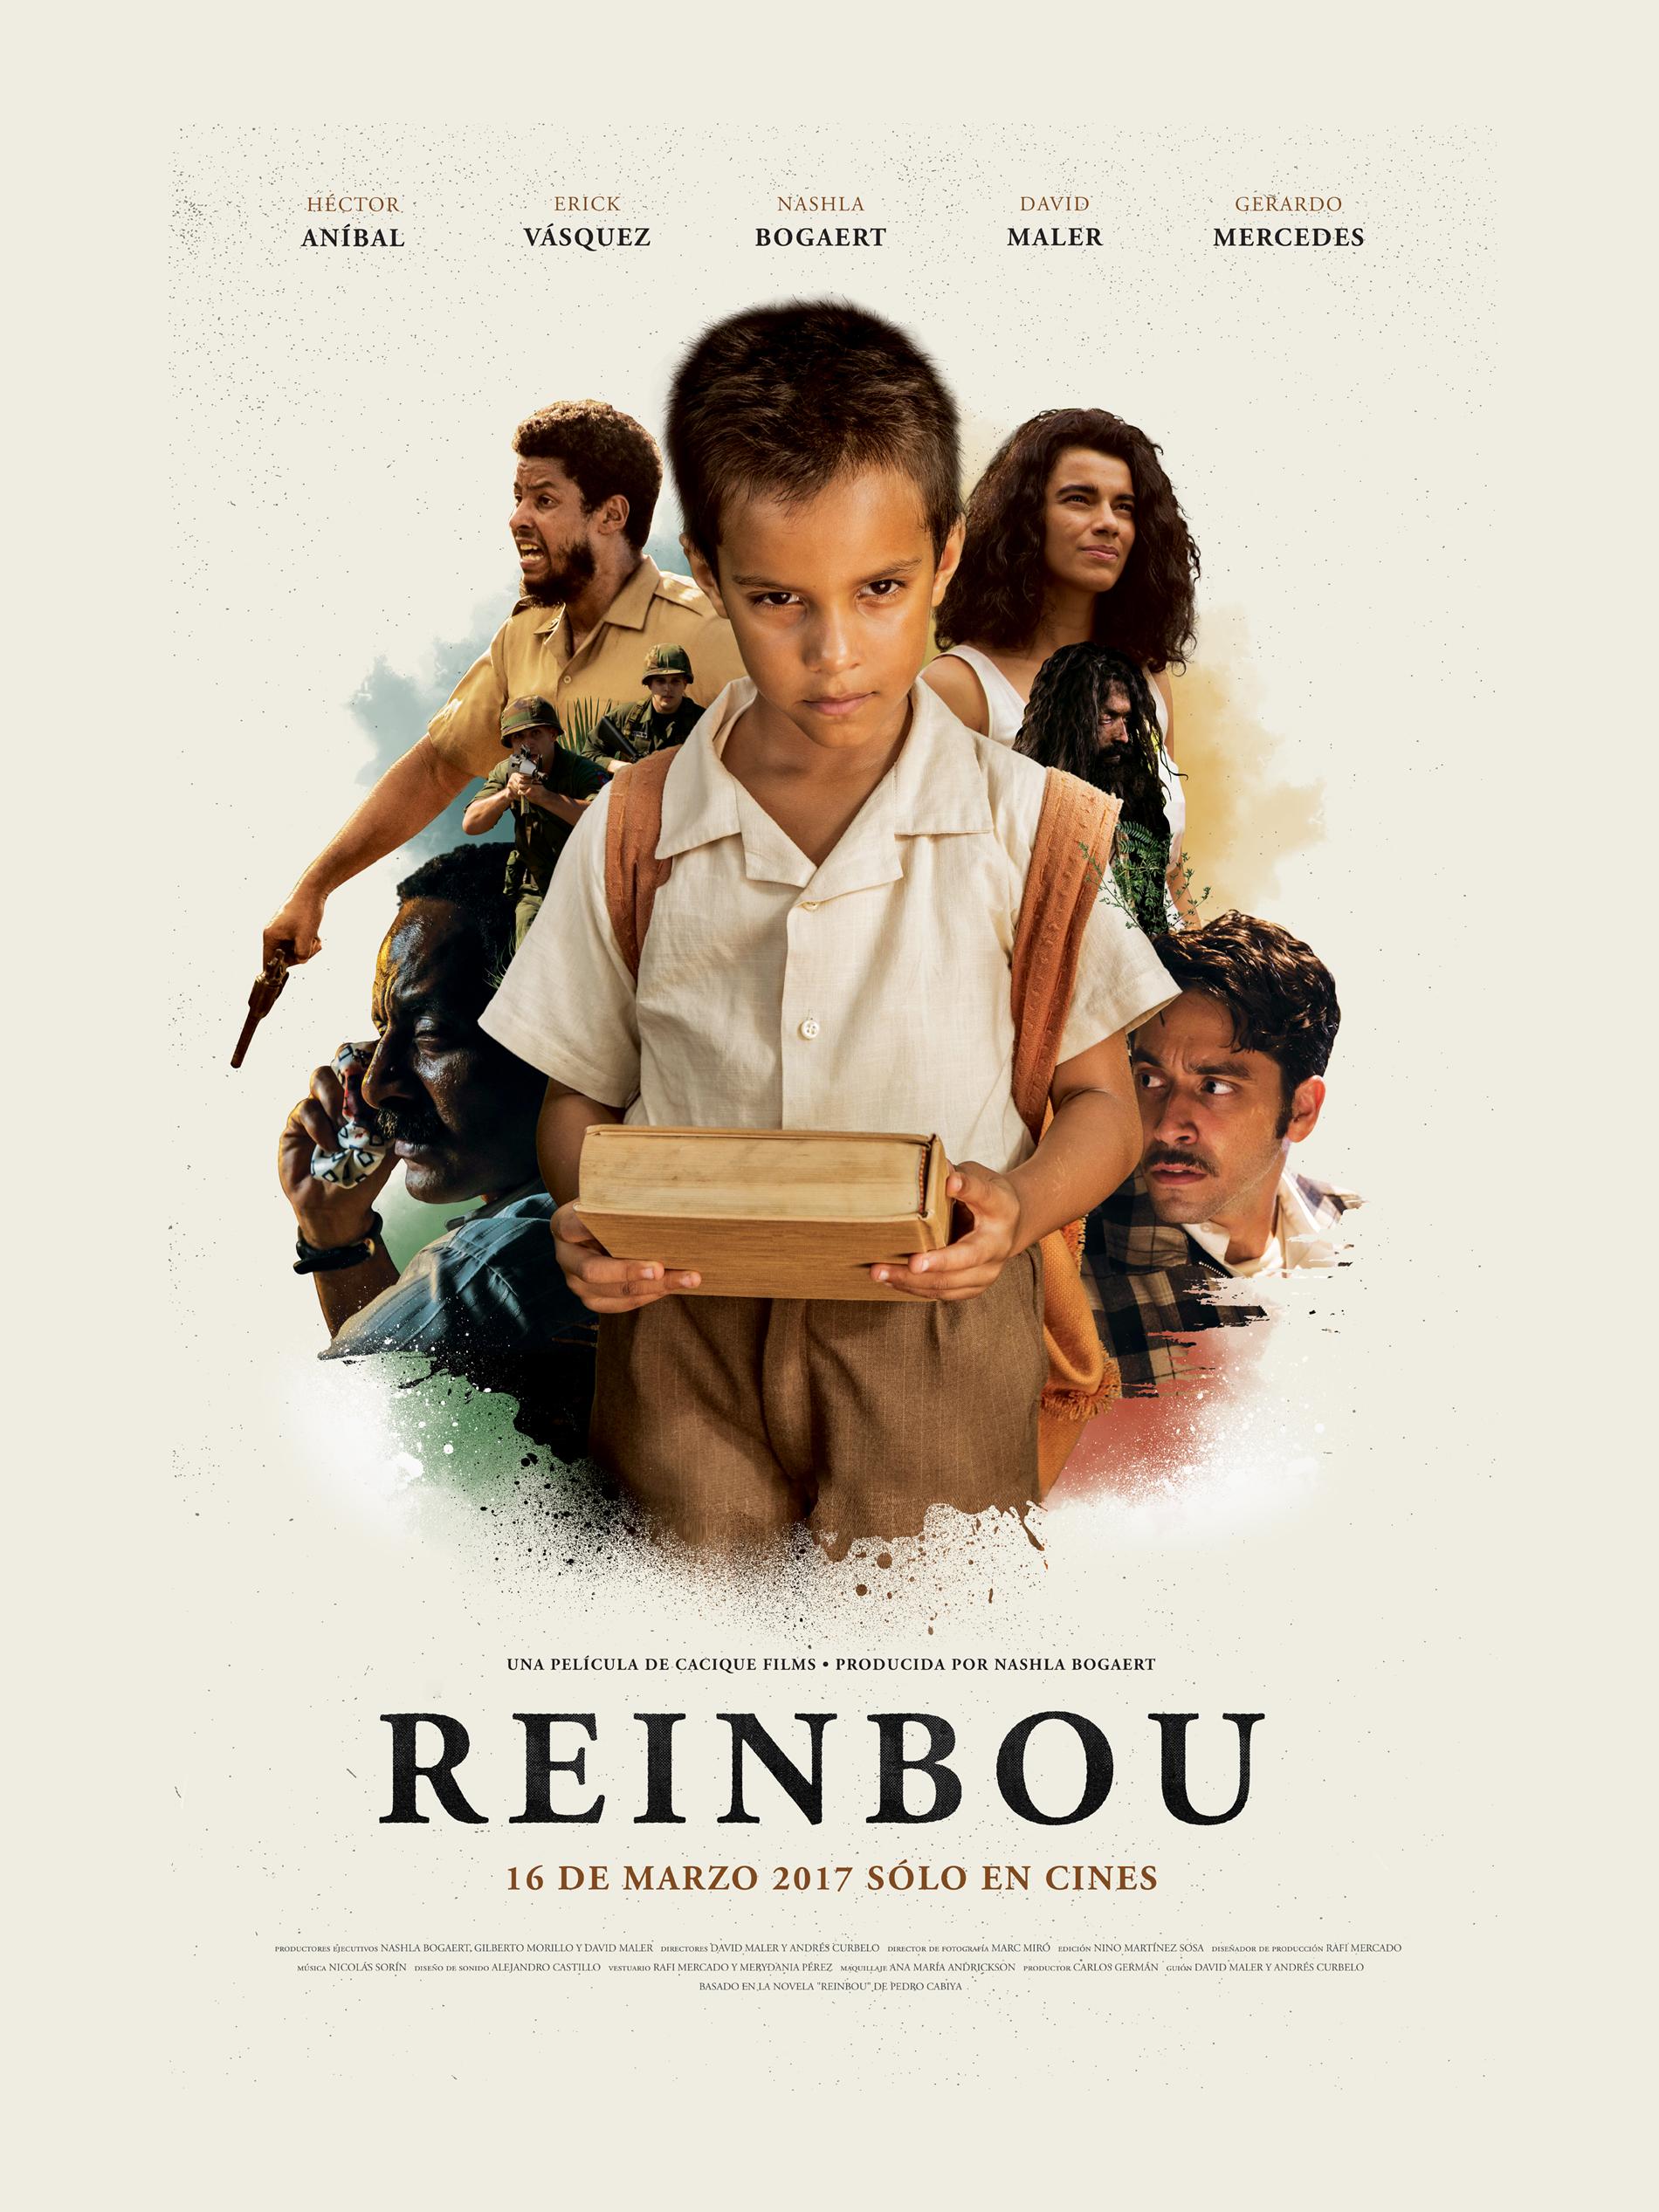 Reinbou_Project6_Reinbou.jpg